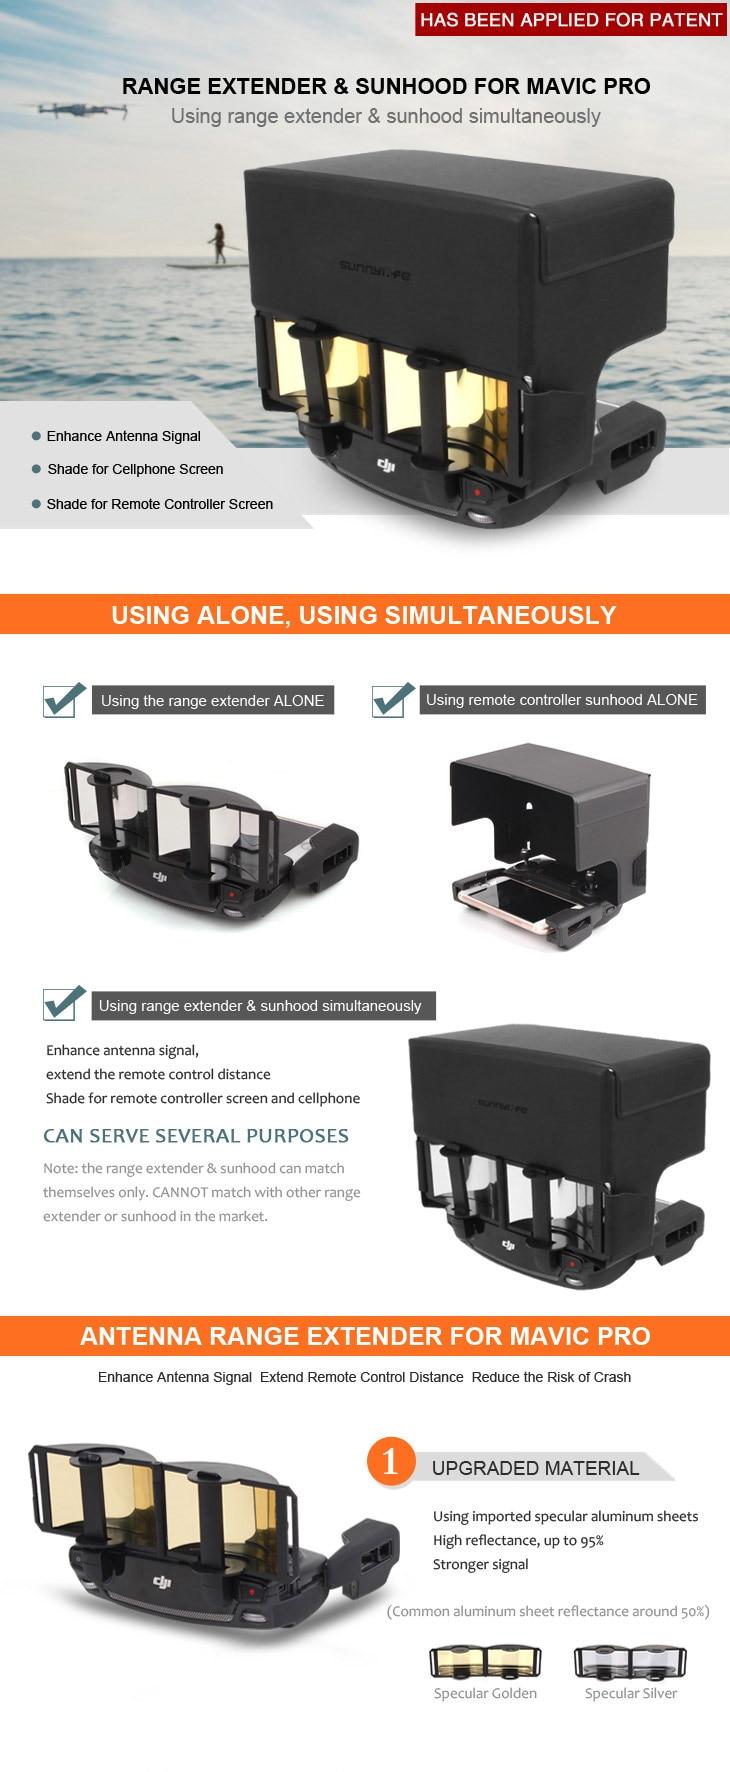 2 in 1 Antenna Range Extender& Remote Controller Sunhood Sunshade Enhance Signal for DJI MAVIC PRO/SPARK Drone Accessories